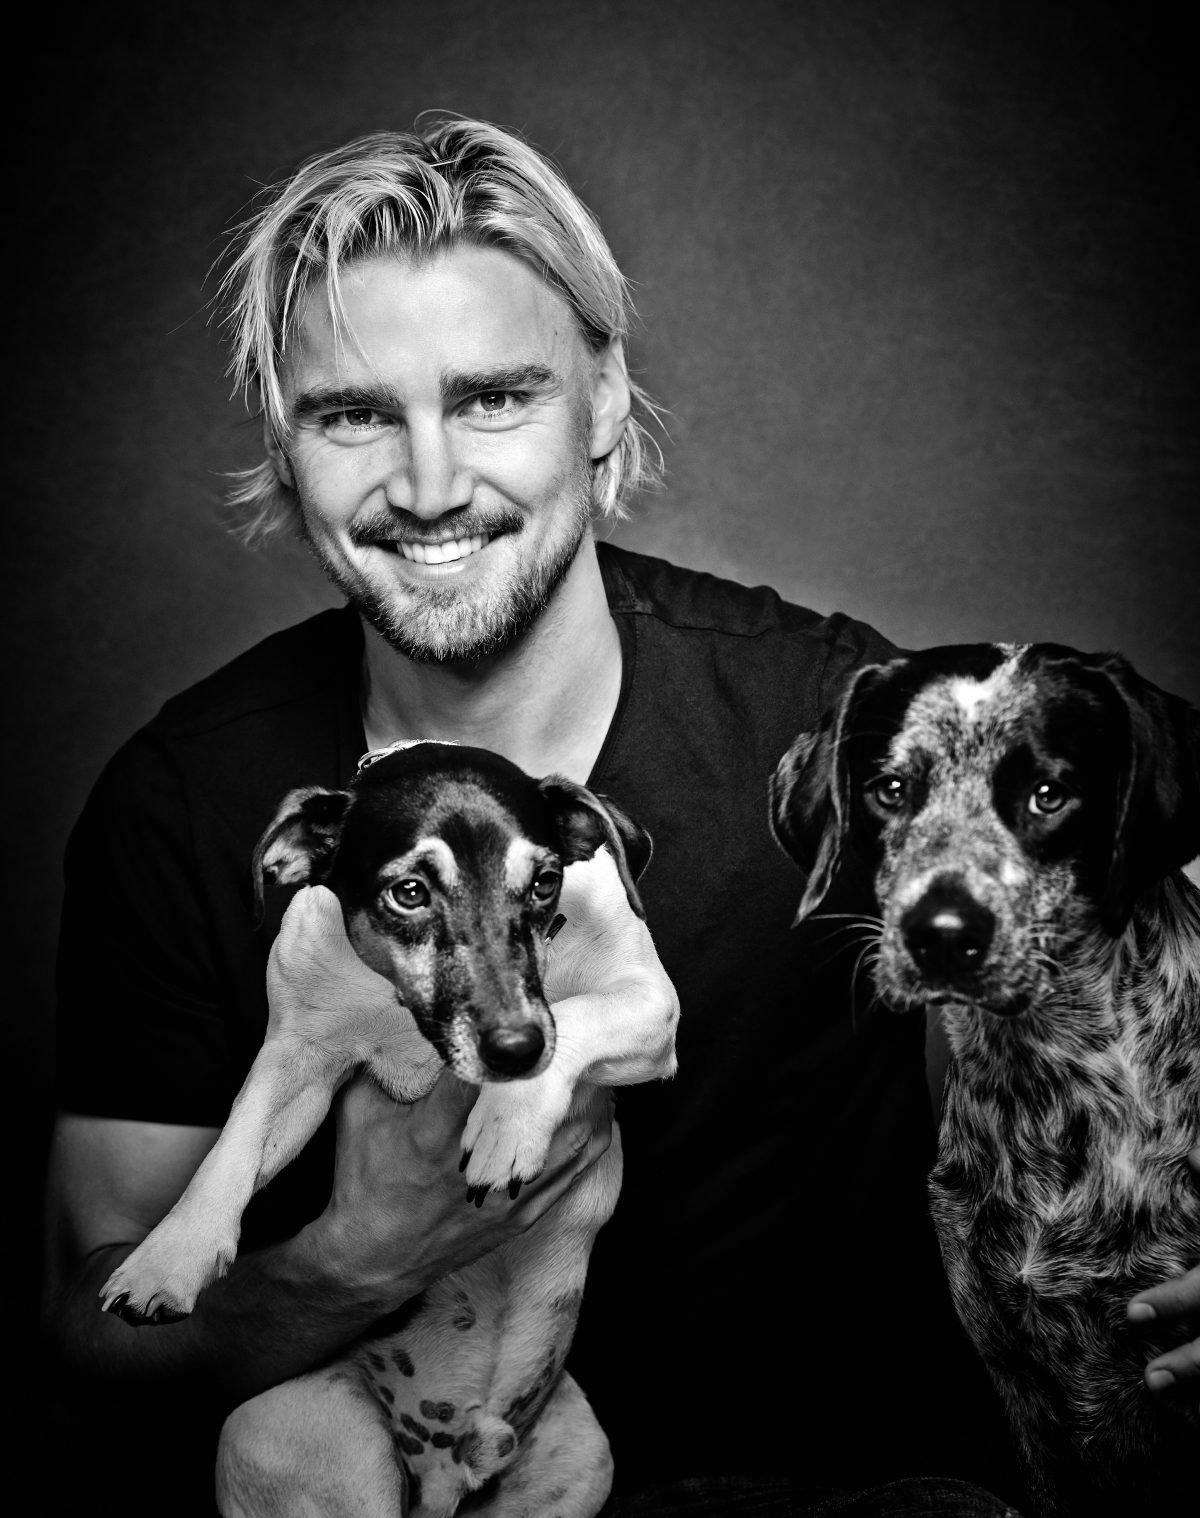 marcel-schmelzer-fuer-mein-charity-buch-prominent-mit-hund-foto-nikolaj-georgiew-www.misterspencer.de